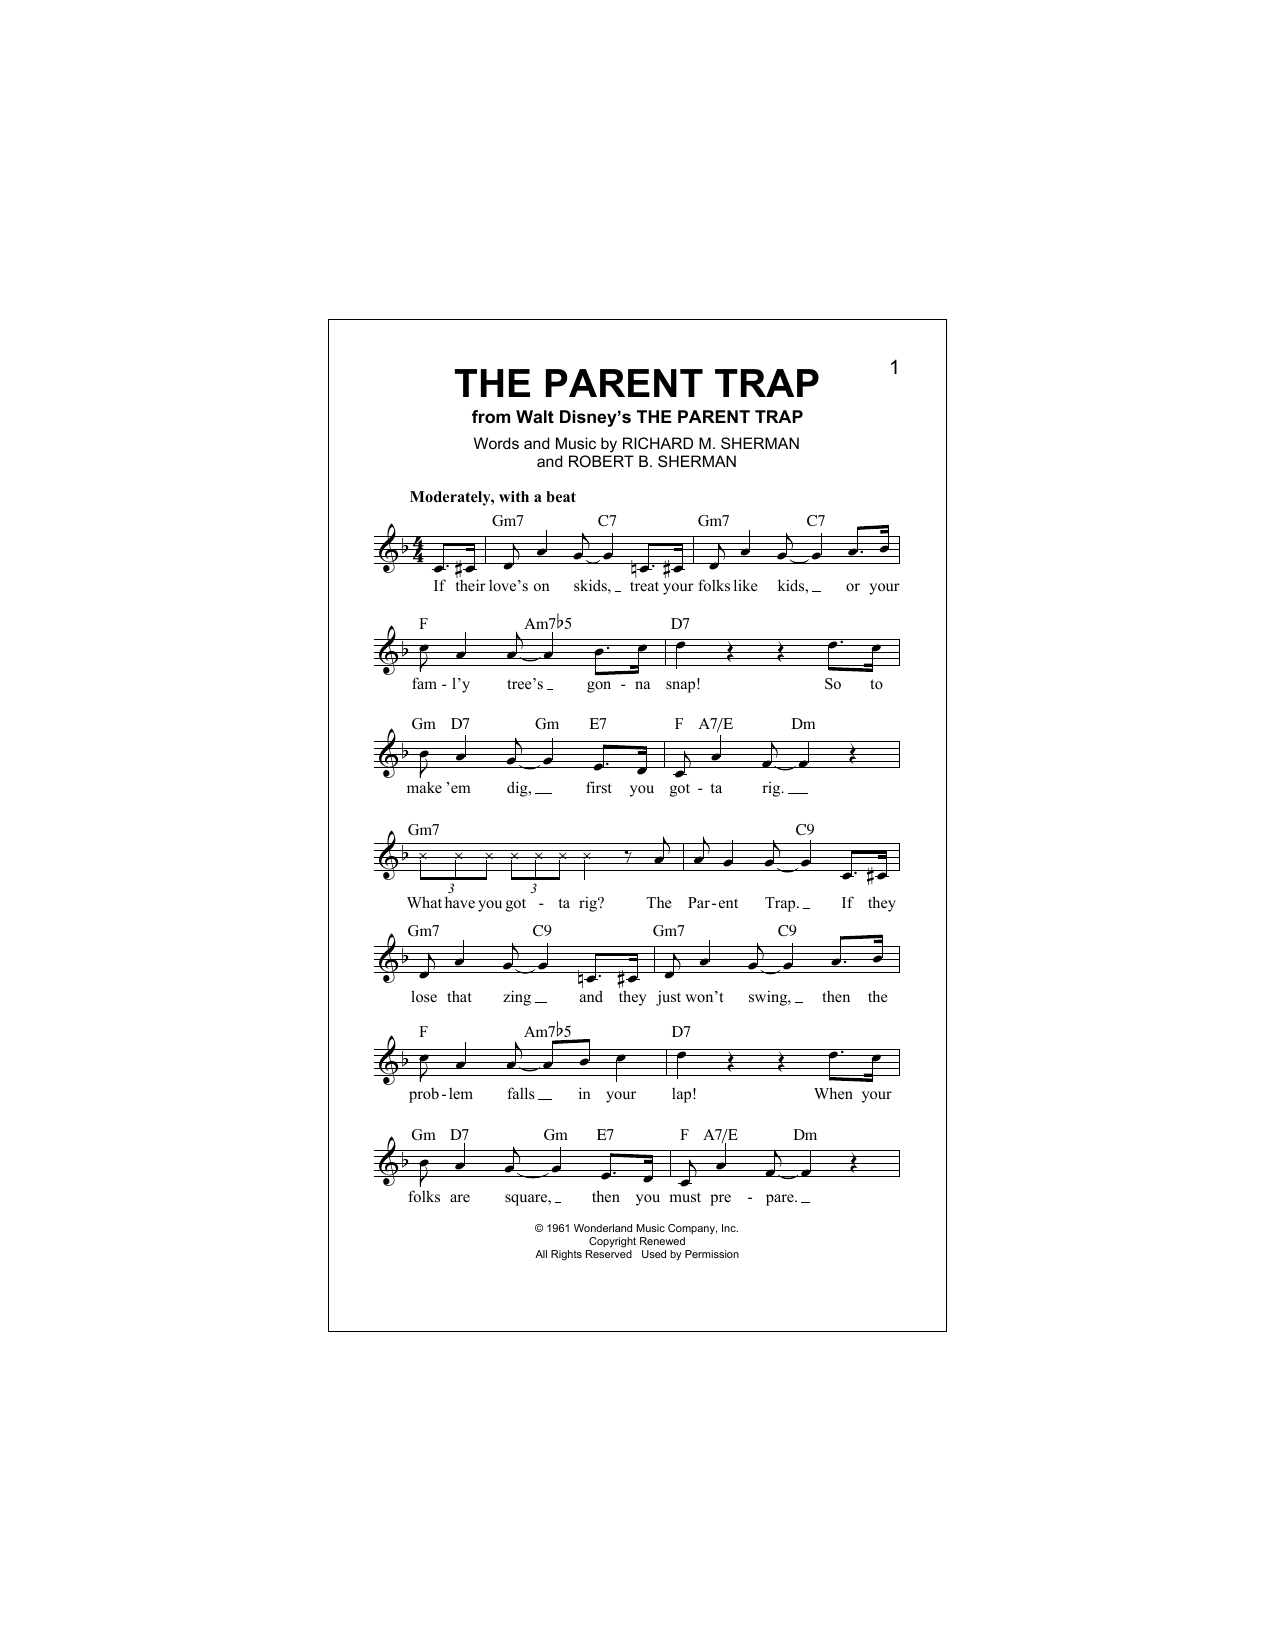 The Parent Trap Sheet Music